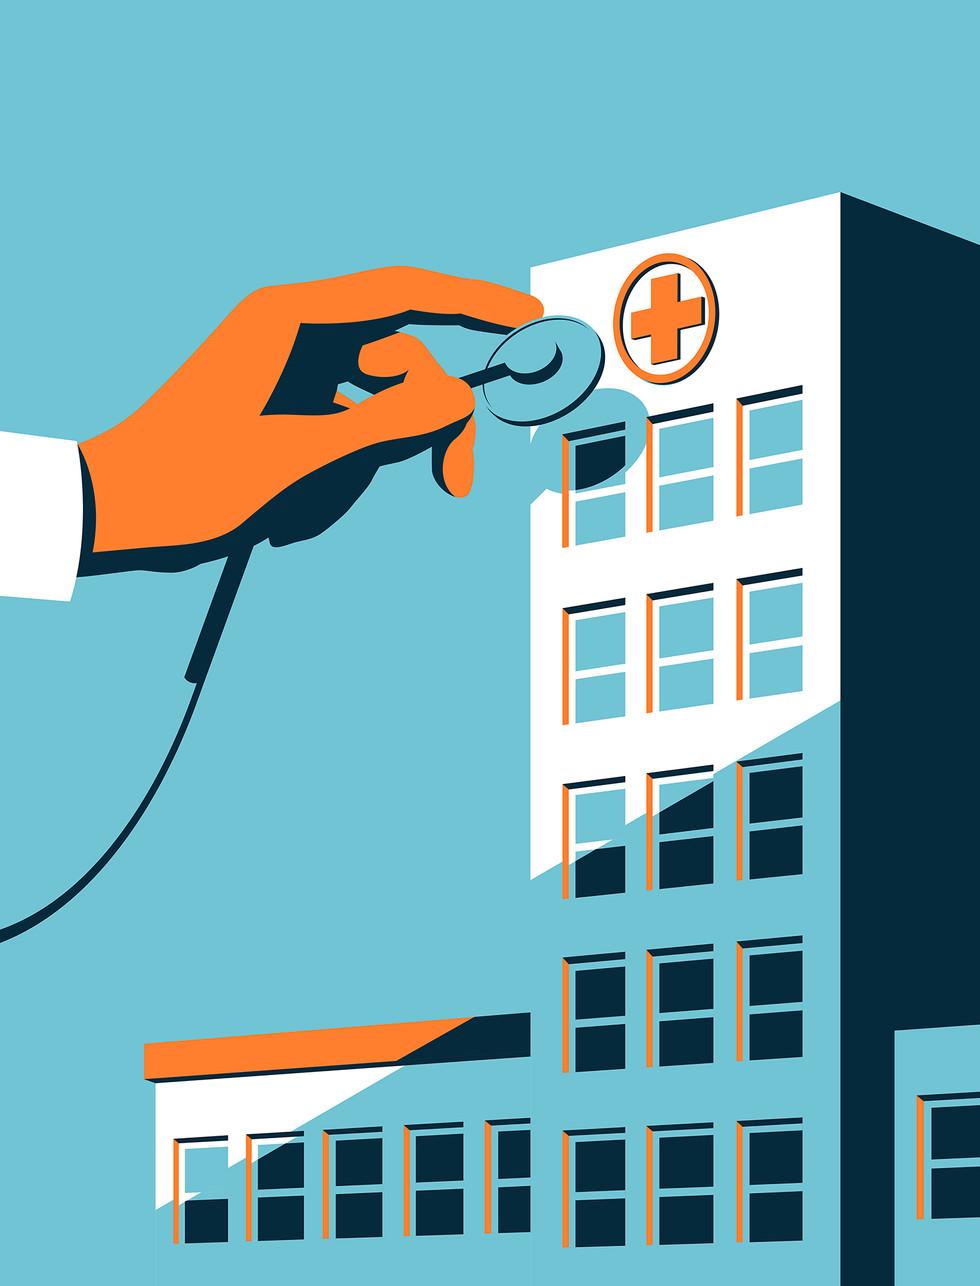 Hospital ratings